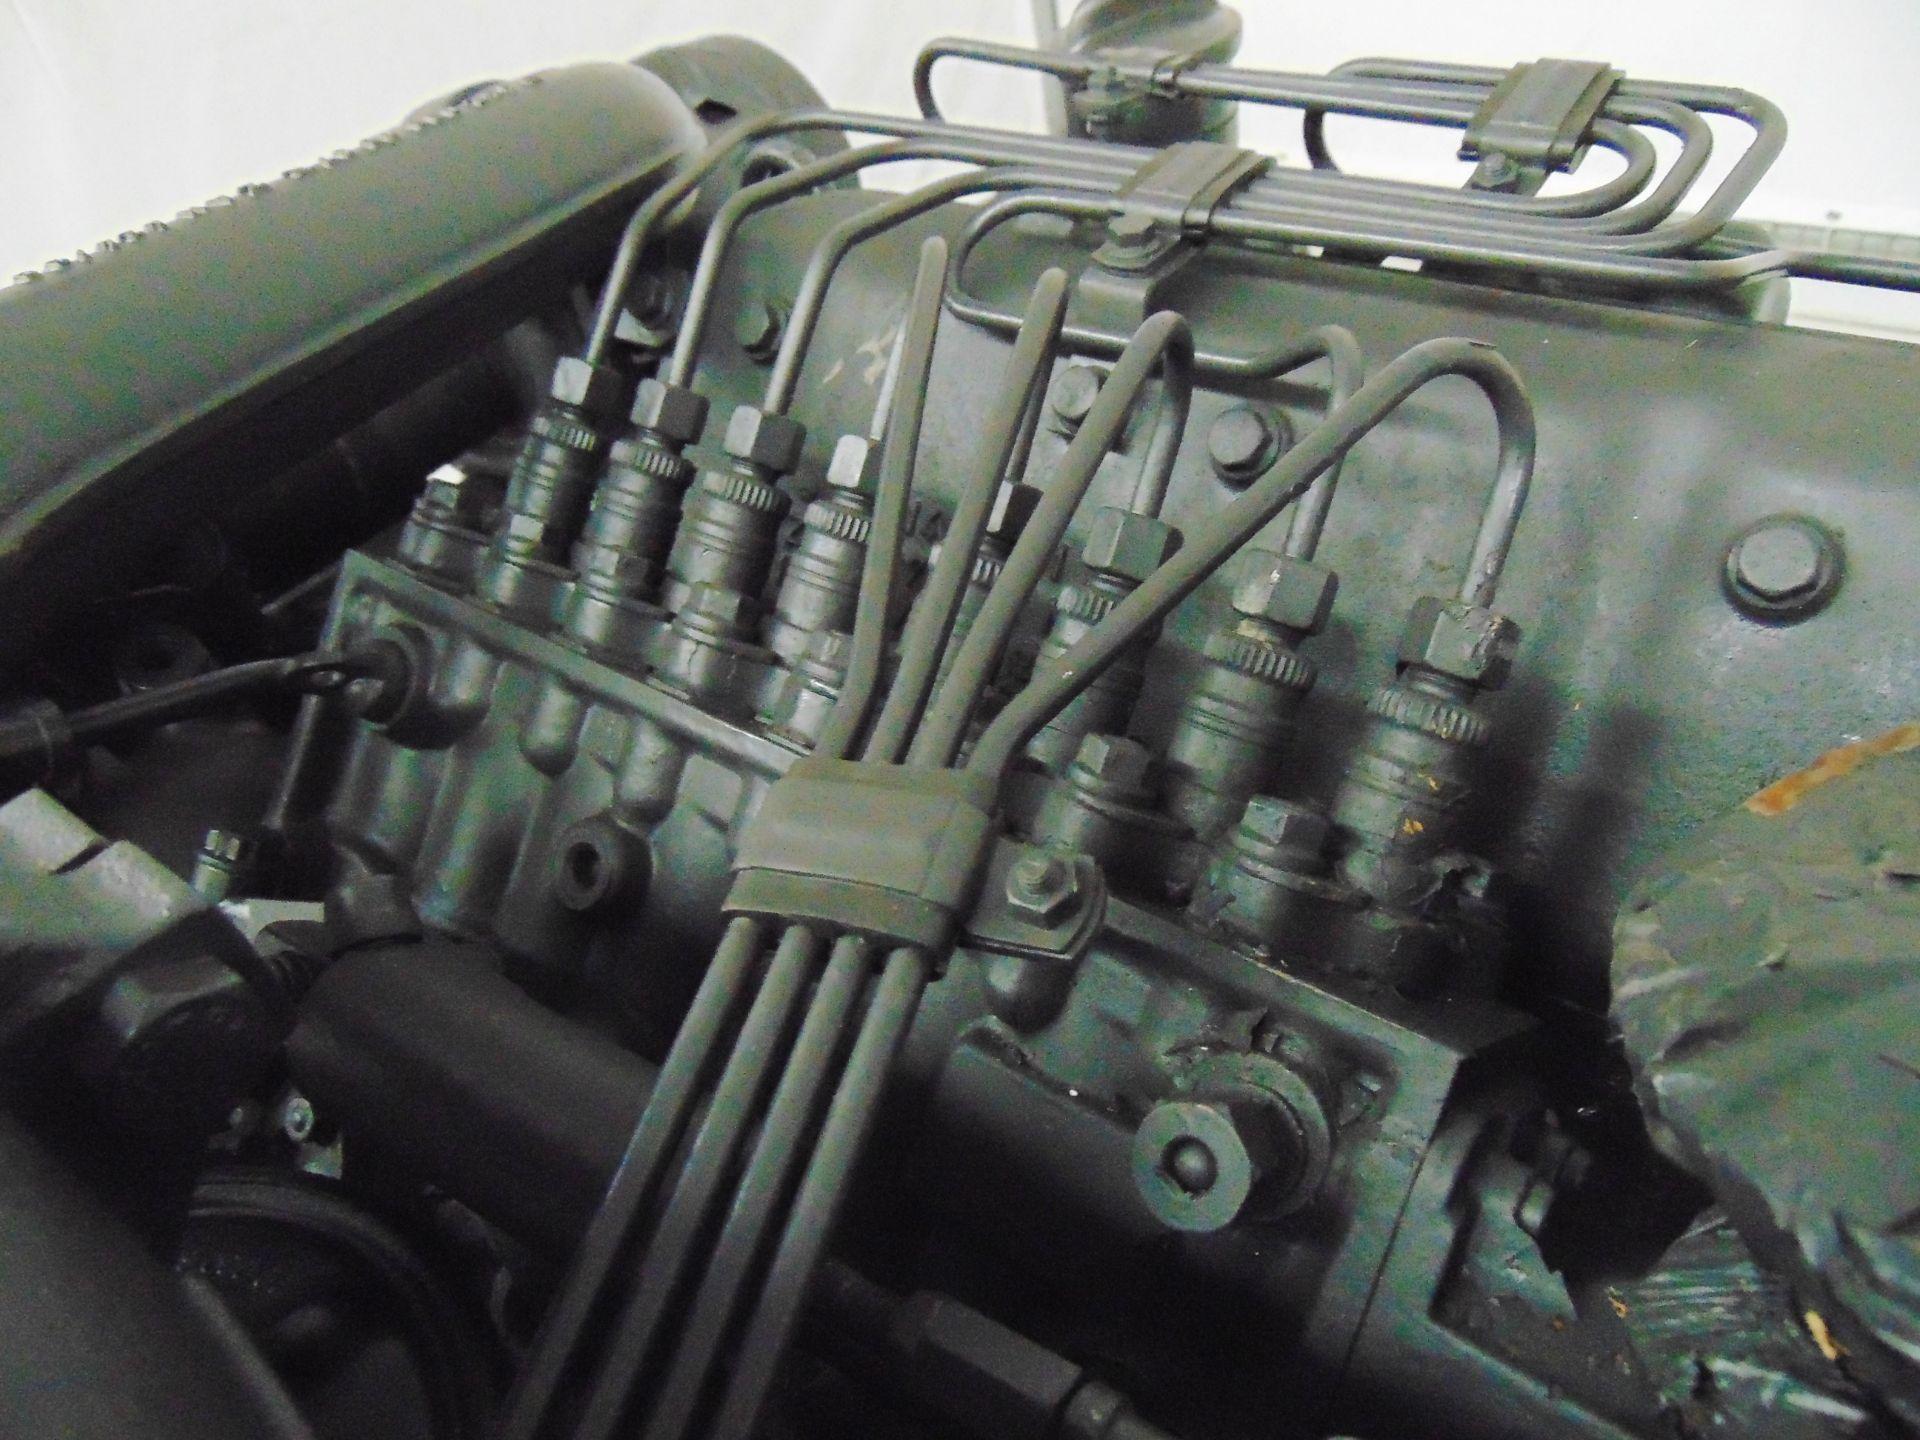 Lot 6 - Brand New & Unused Mercedes-Benz OM402LA V8 Twin Turbo Diesel Engine